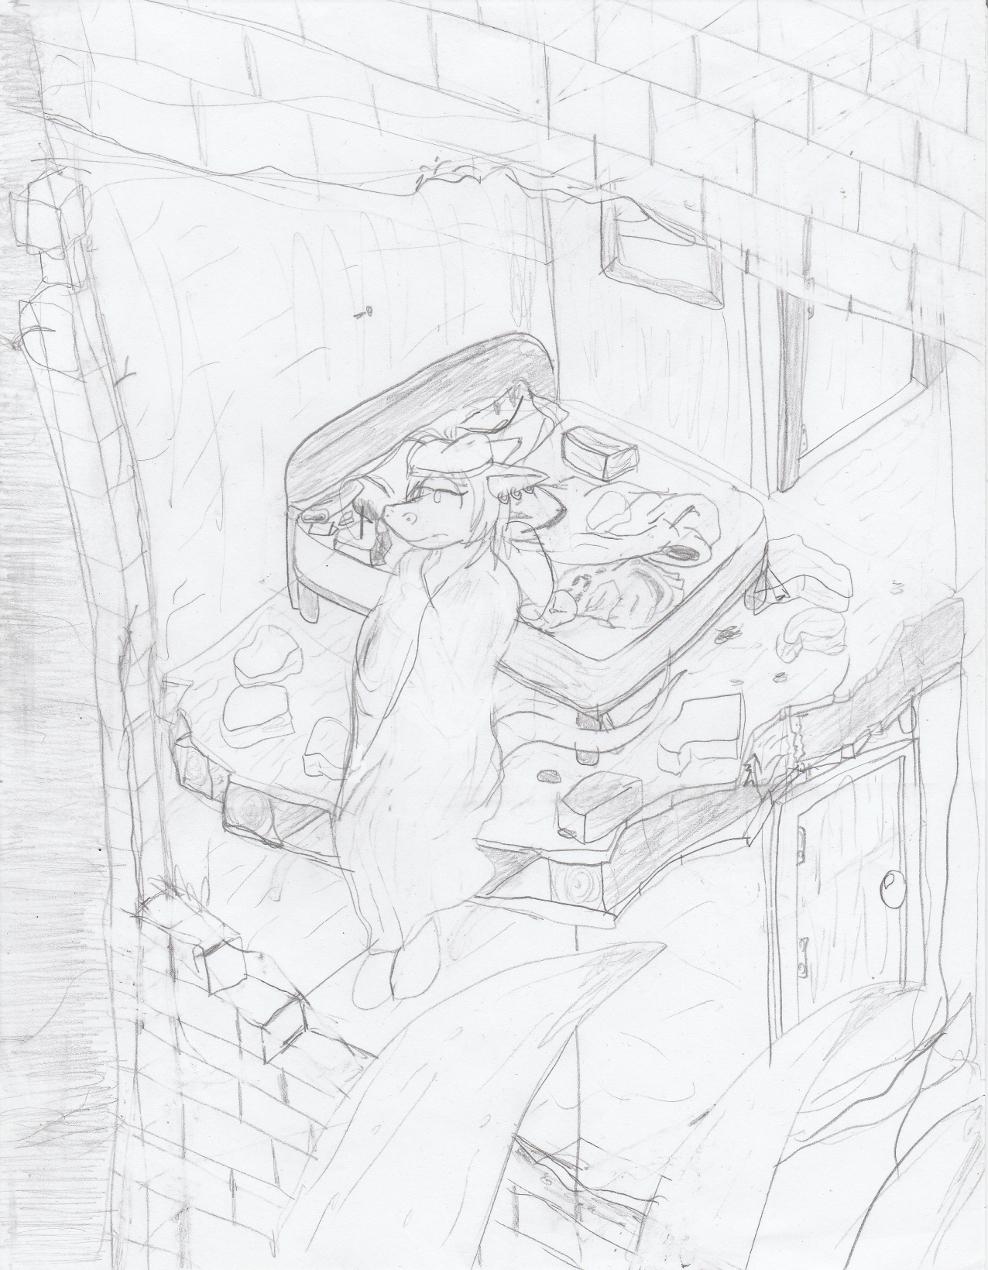 The Divine Wasteland - Destroyed apartment